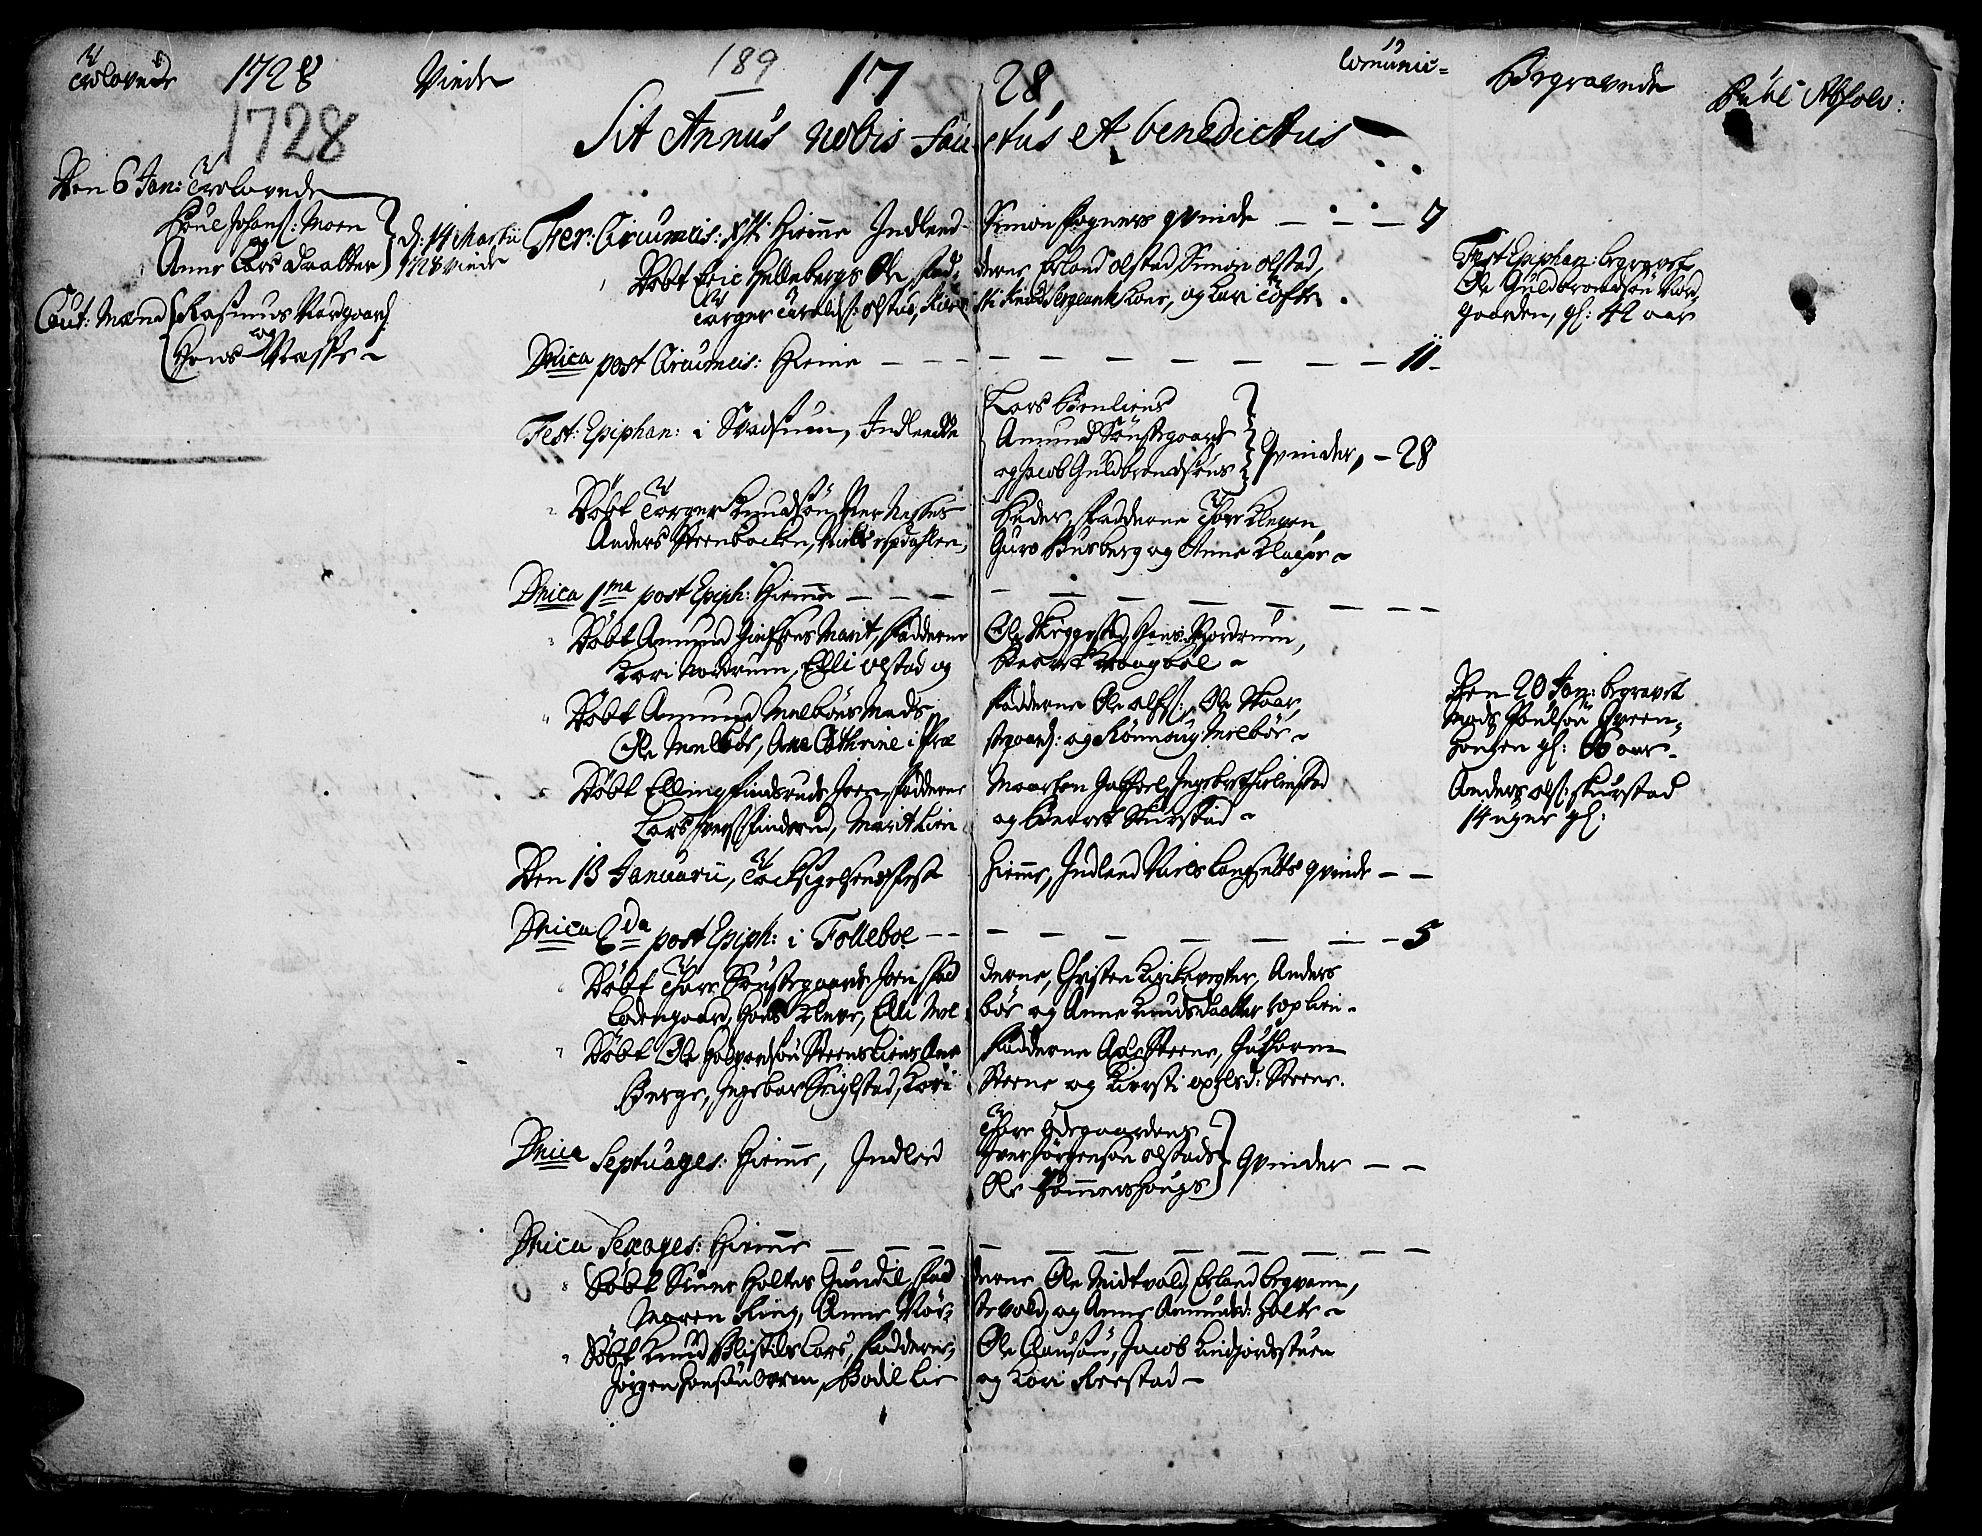 SAH, Gausdal prestekontor, Ministerialbok nr. 1, 1693-1728, s. 189